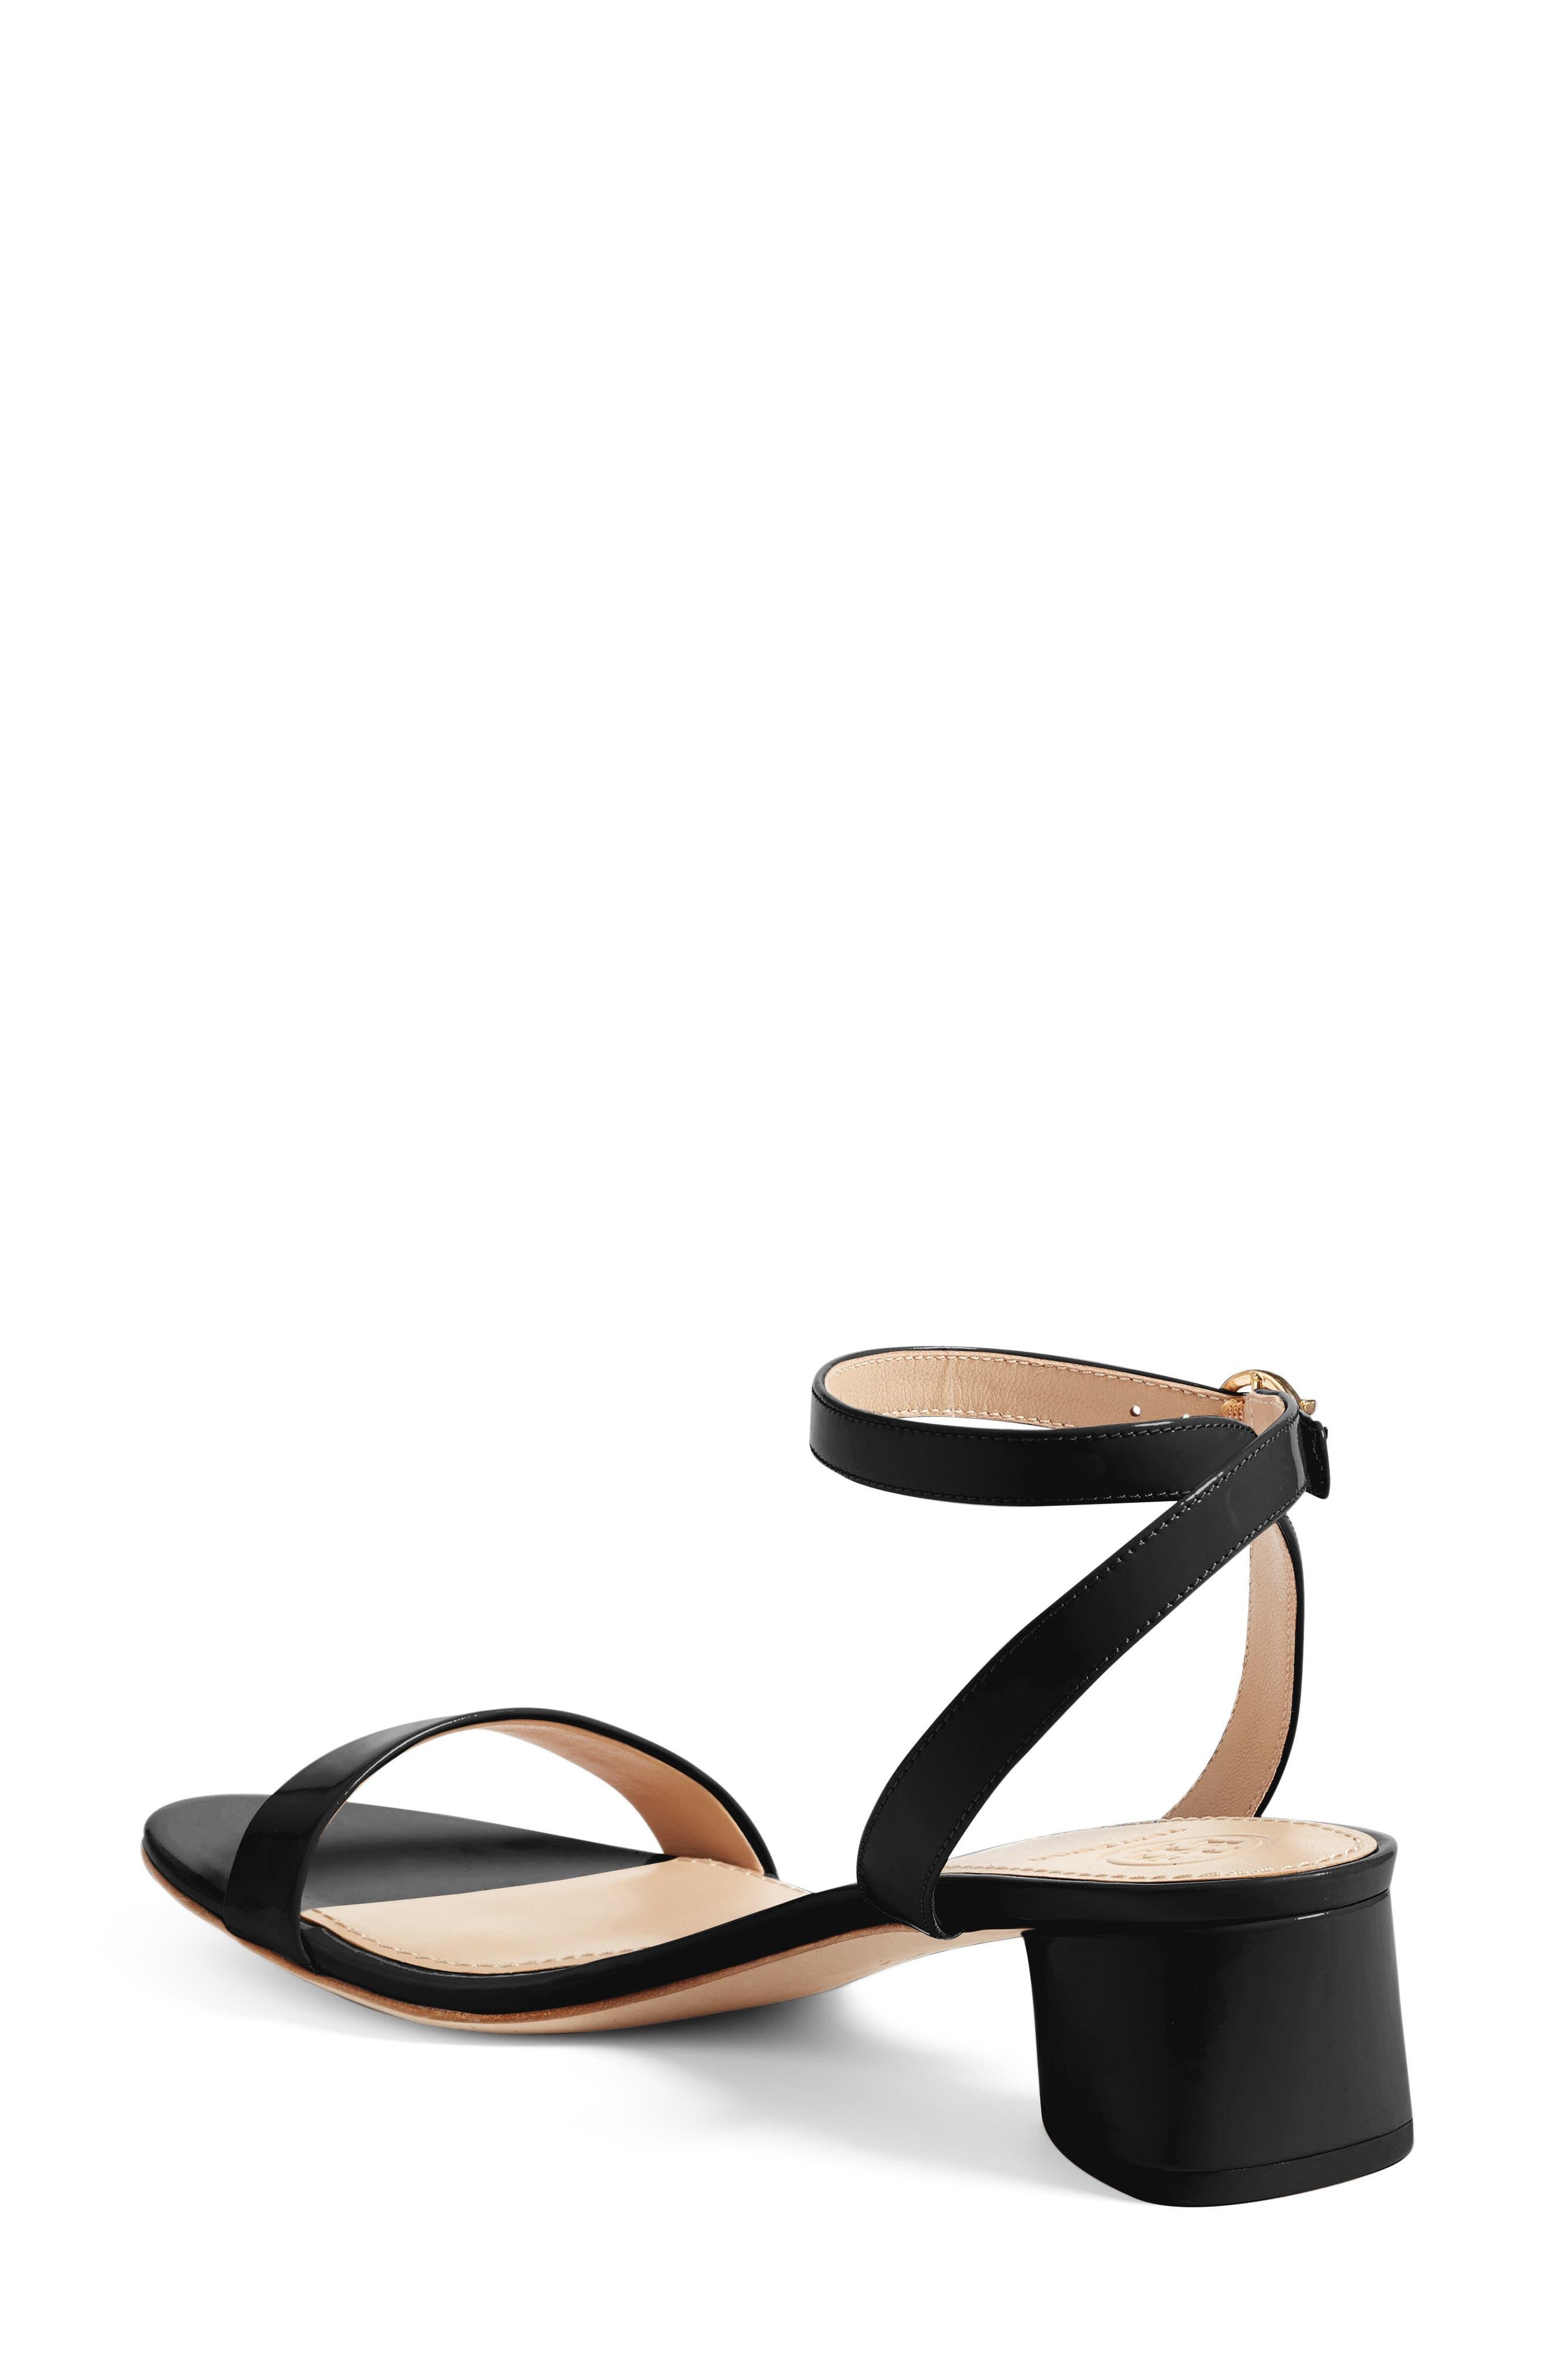 Elizabeth Block Heel Sandal,                             Alternate thumbnail 4, color,